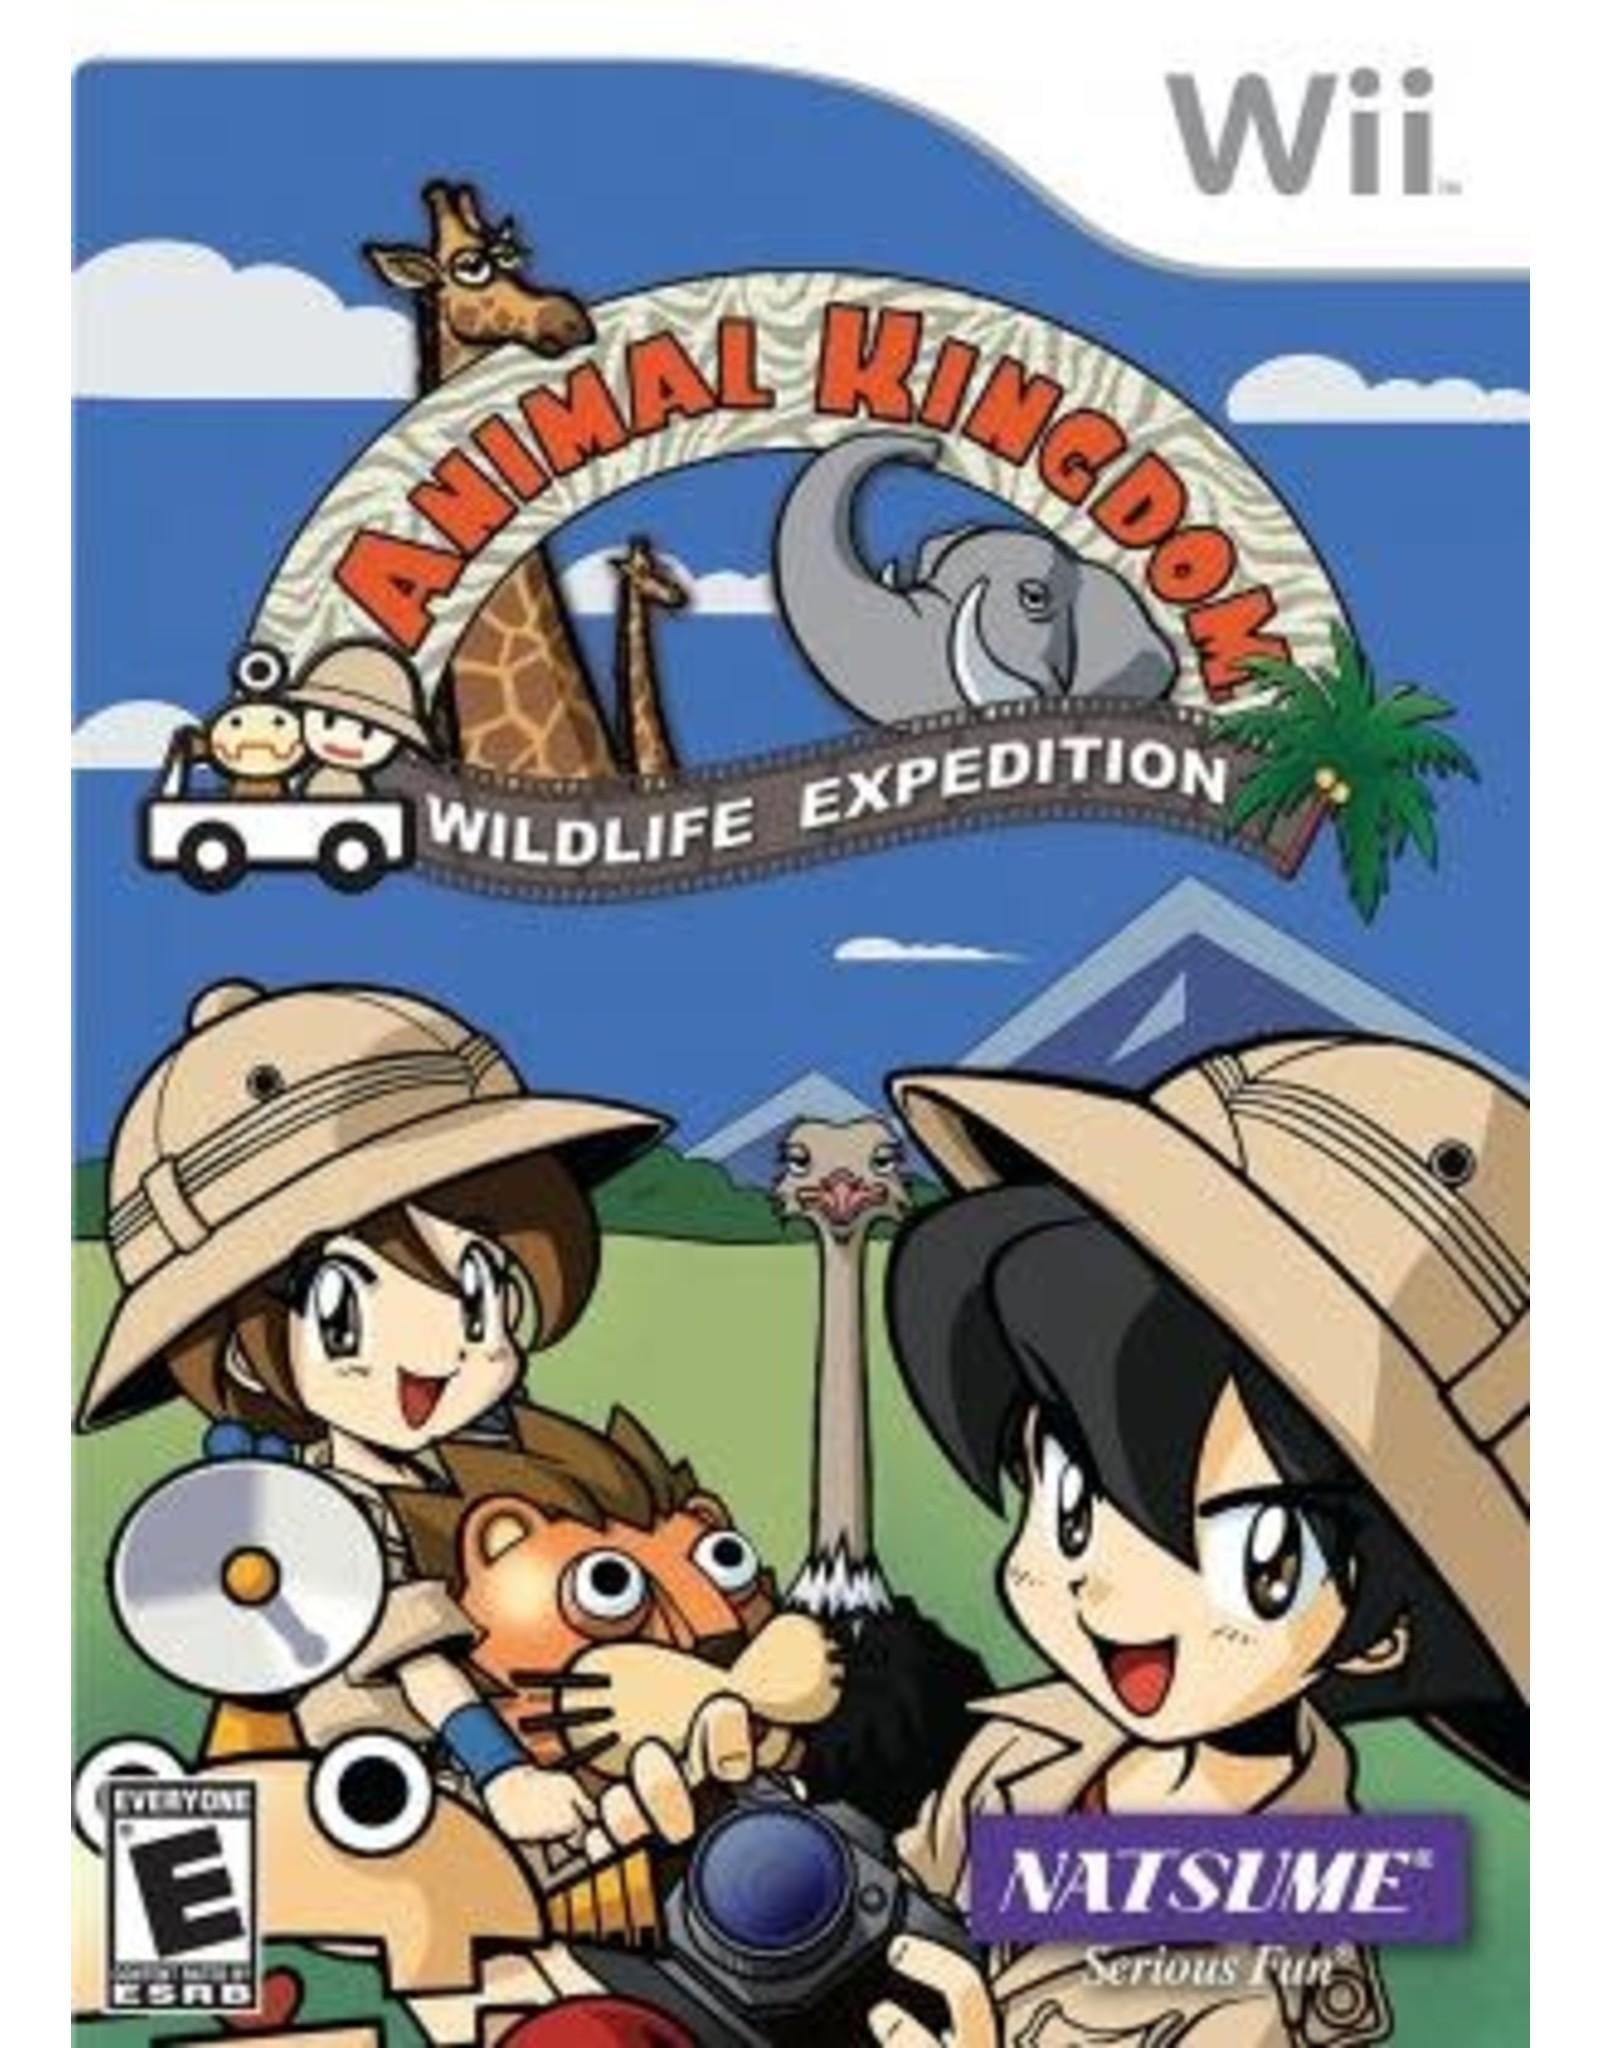 Wii Animal Kingdom: Wildlife Expedition (CiB)